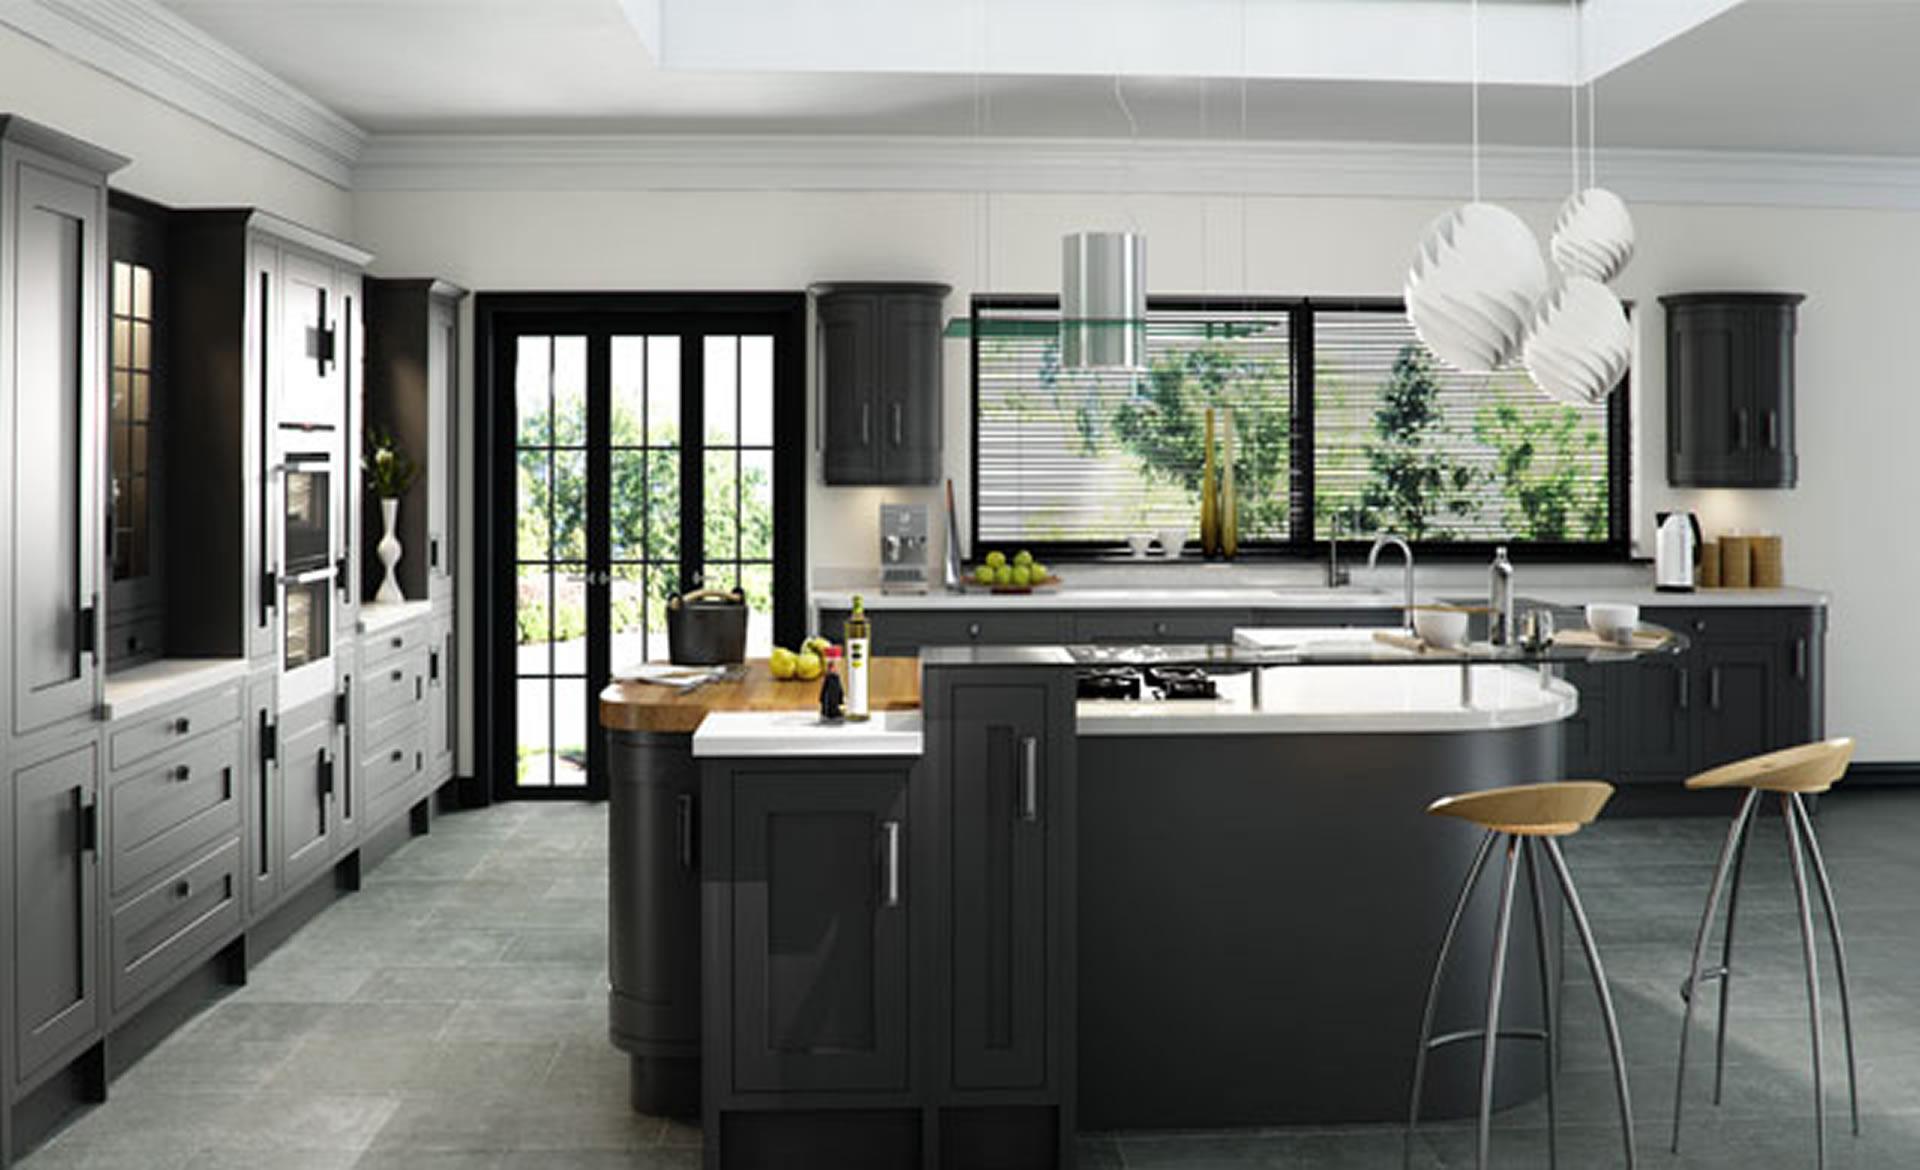 Kitchen Design Iona Inframe Painted Graphite